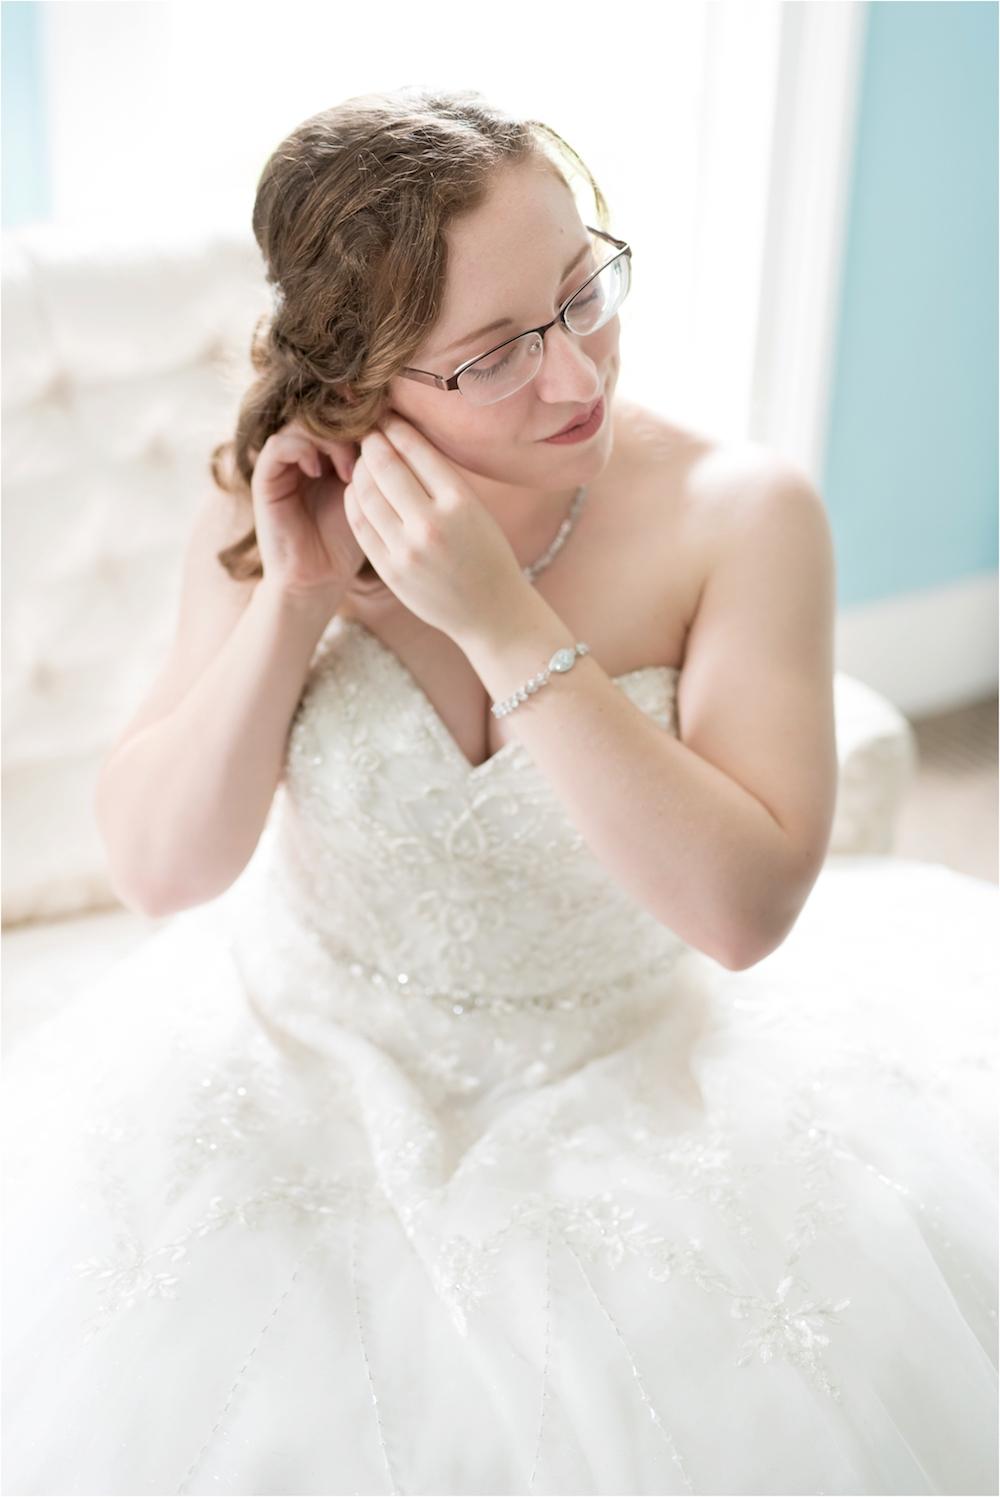 downtown-detroit-classic-elegant-wedding-photo-29.jpg